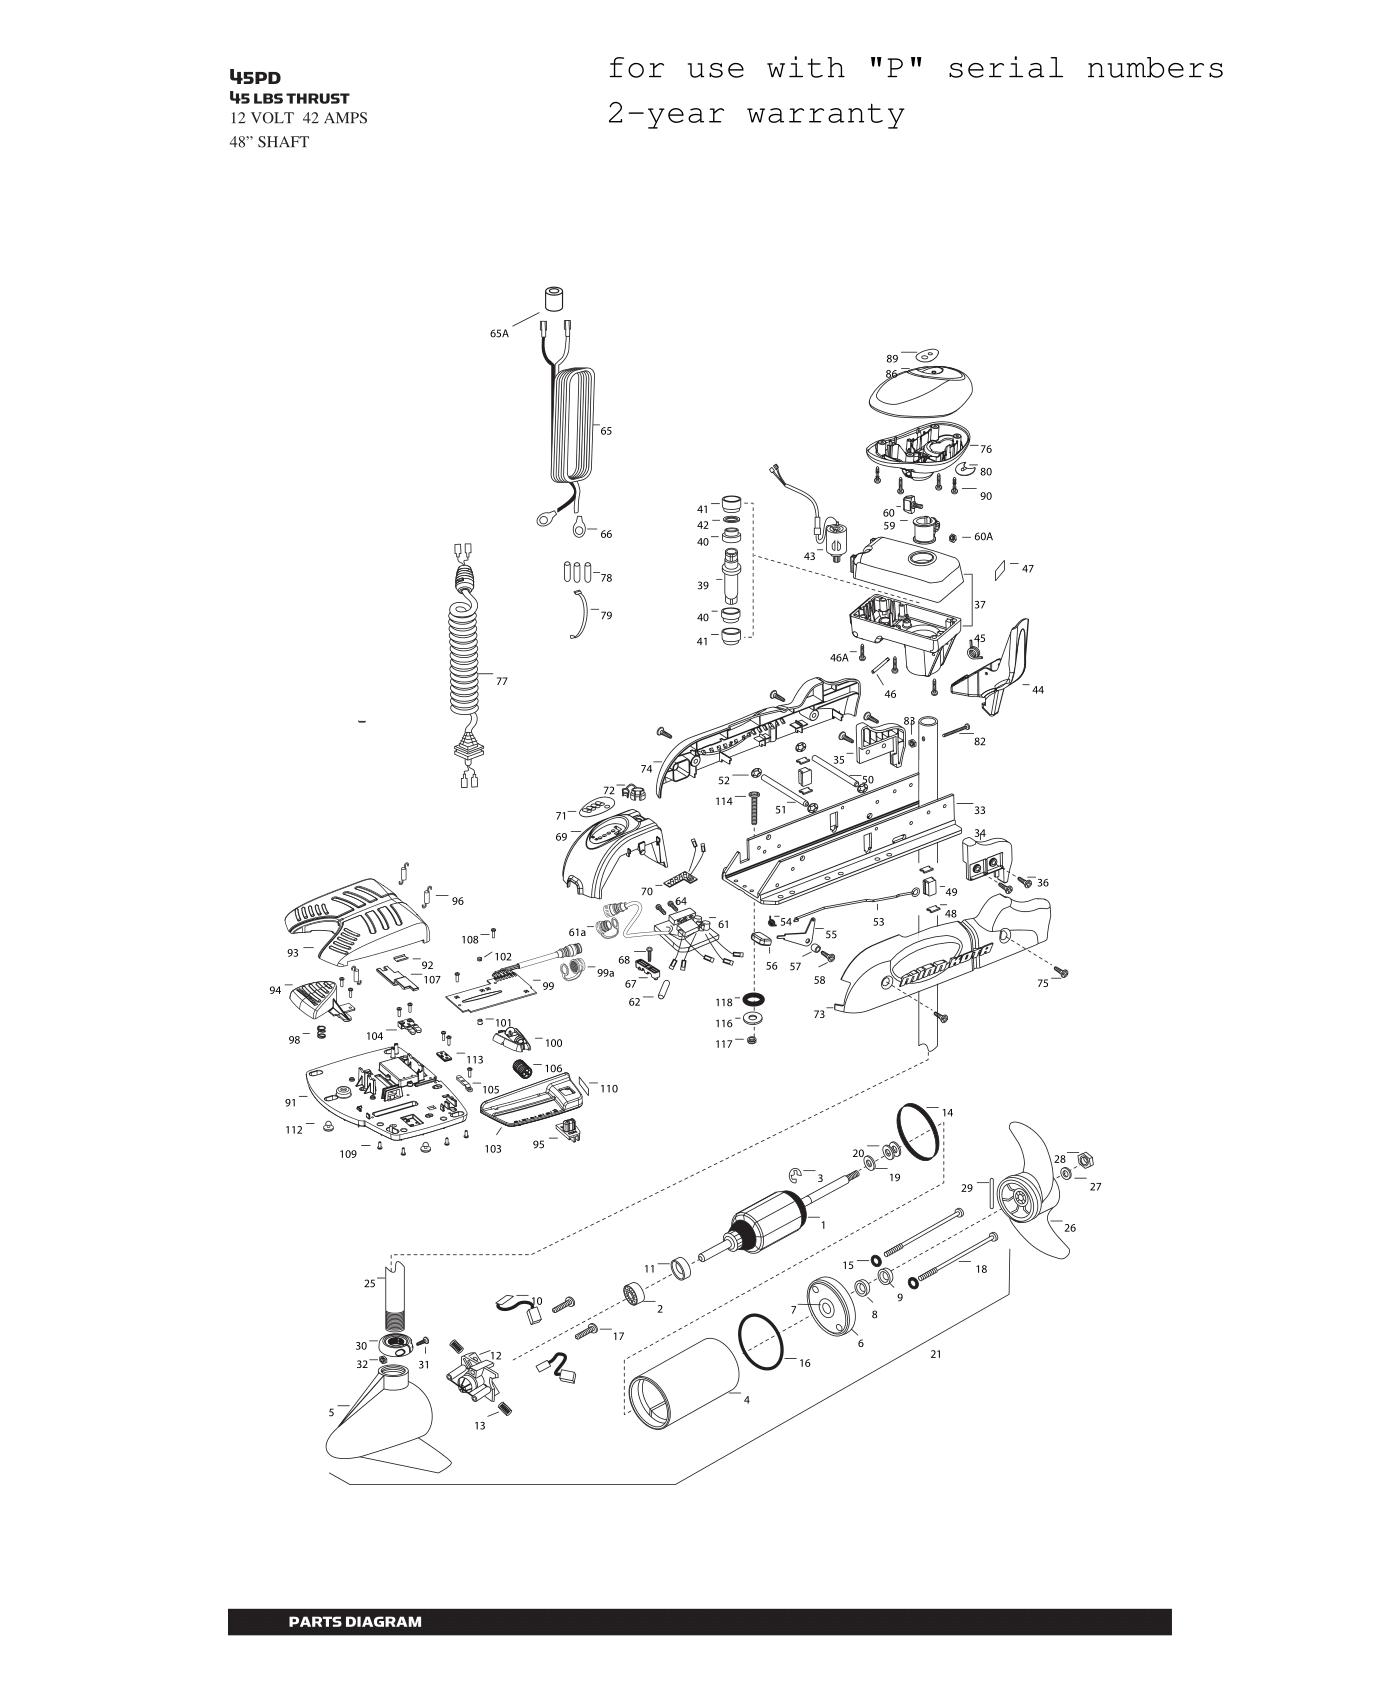 Minn Kota Powerdrive V2 45 Parts